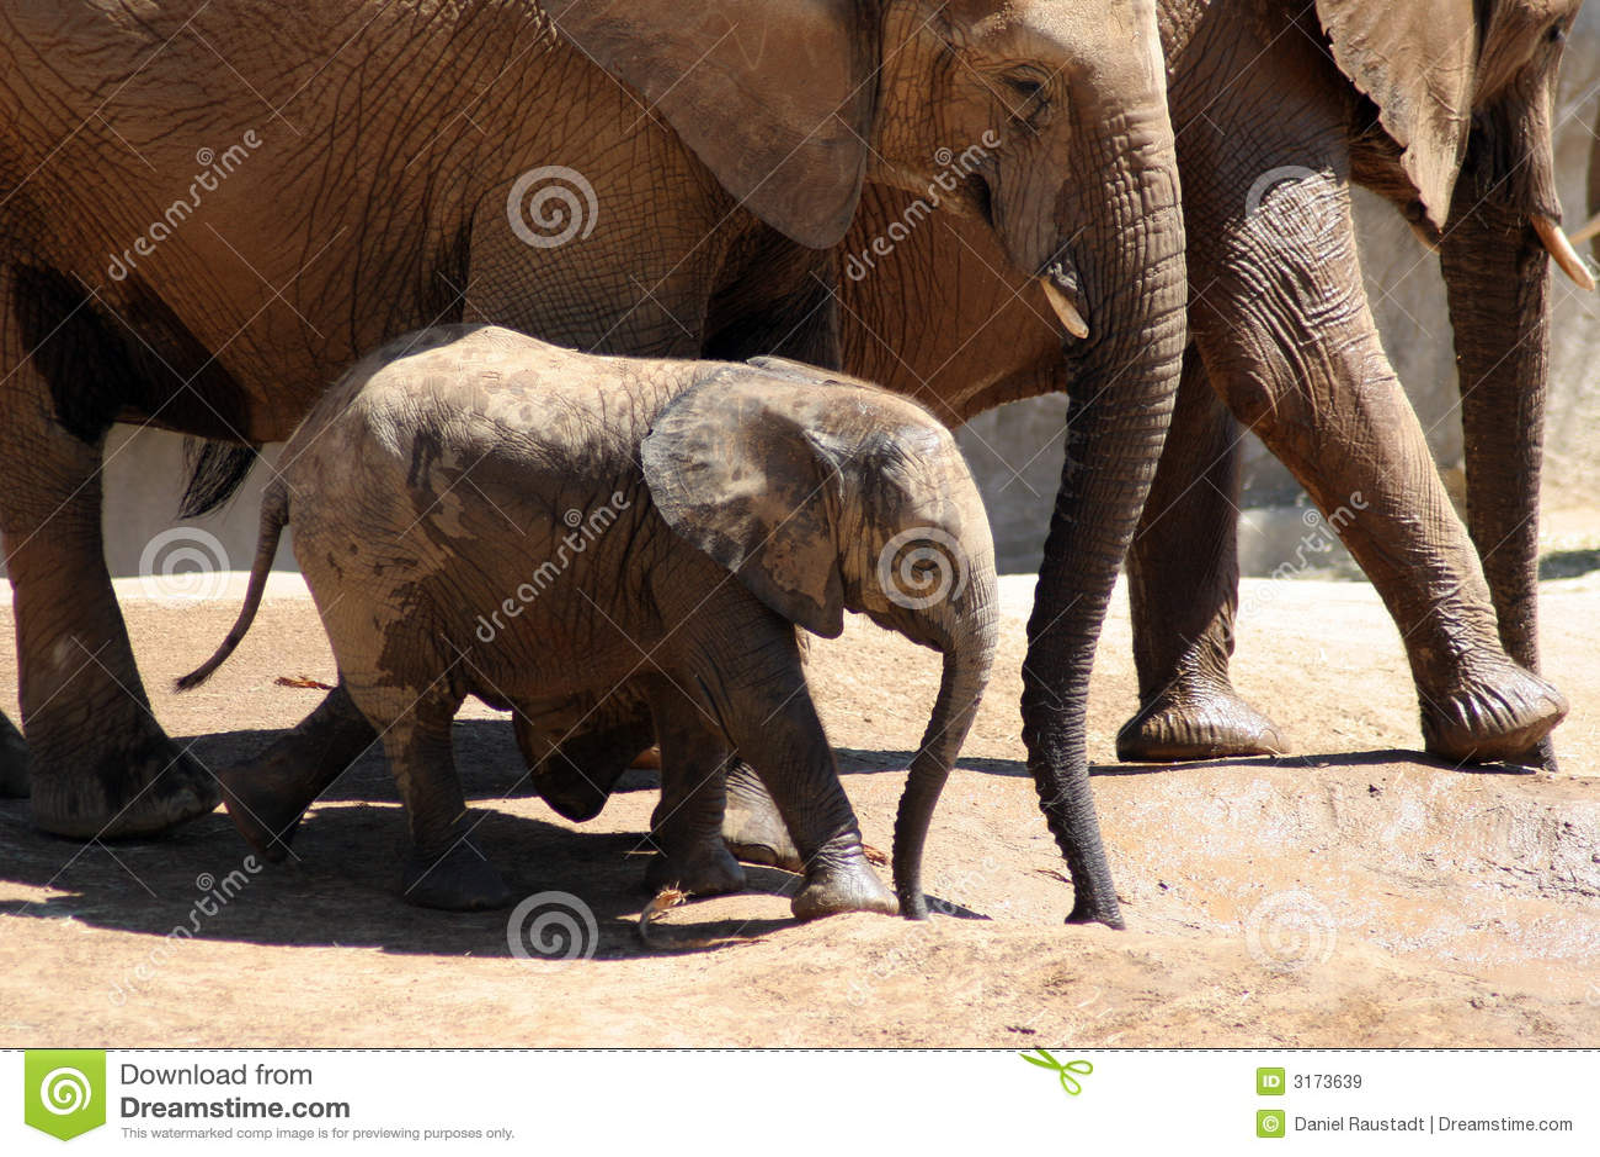 baby elephant after bath royalty free stock images image 3173639. Black Bedroom Furniture Sets. Home Design Ideas